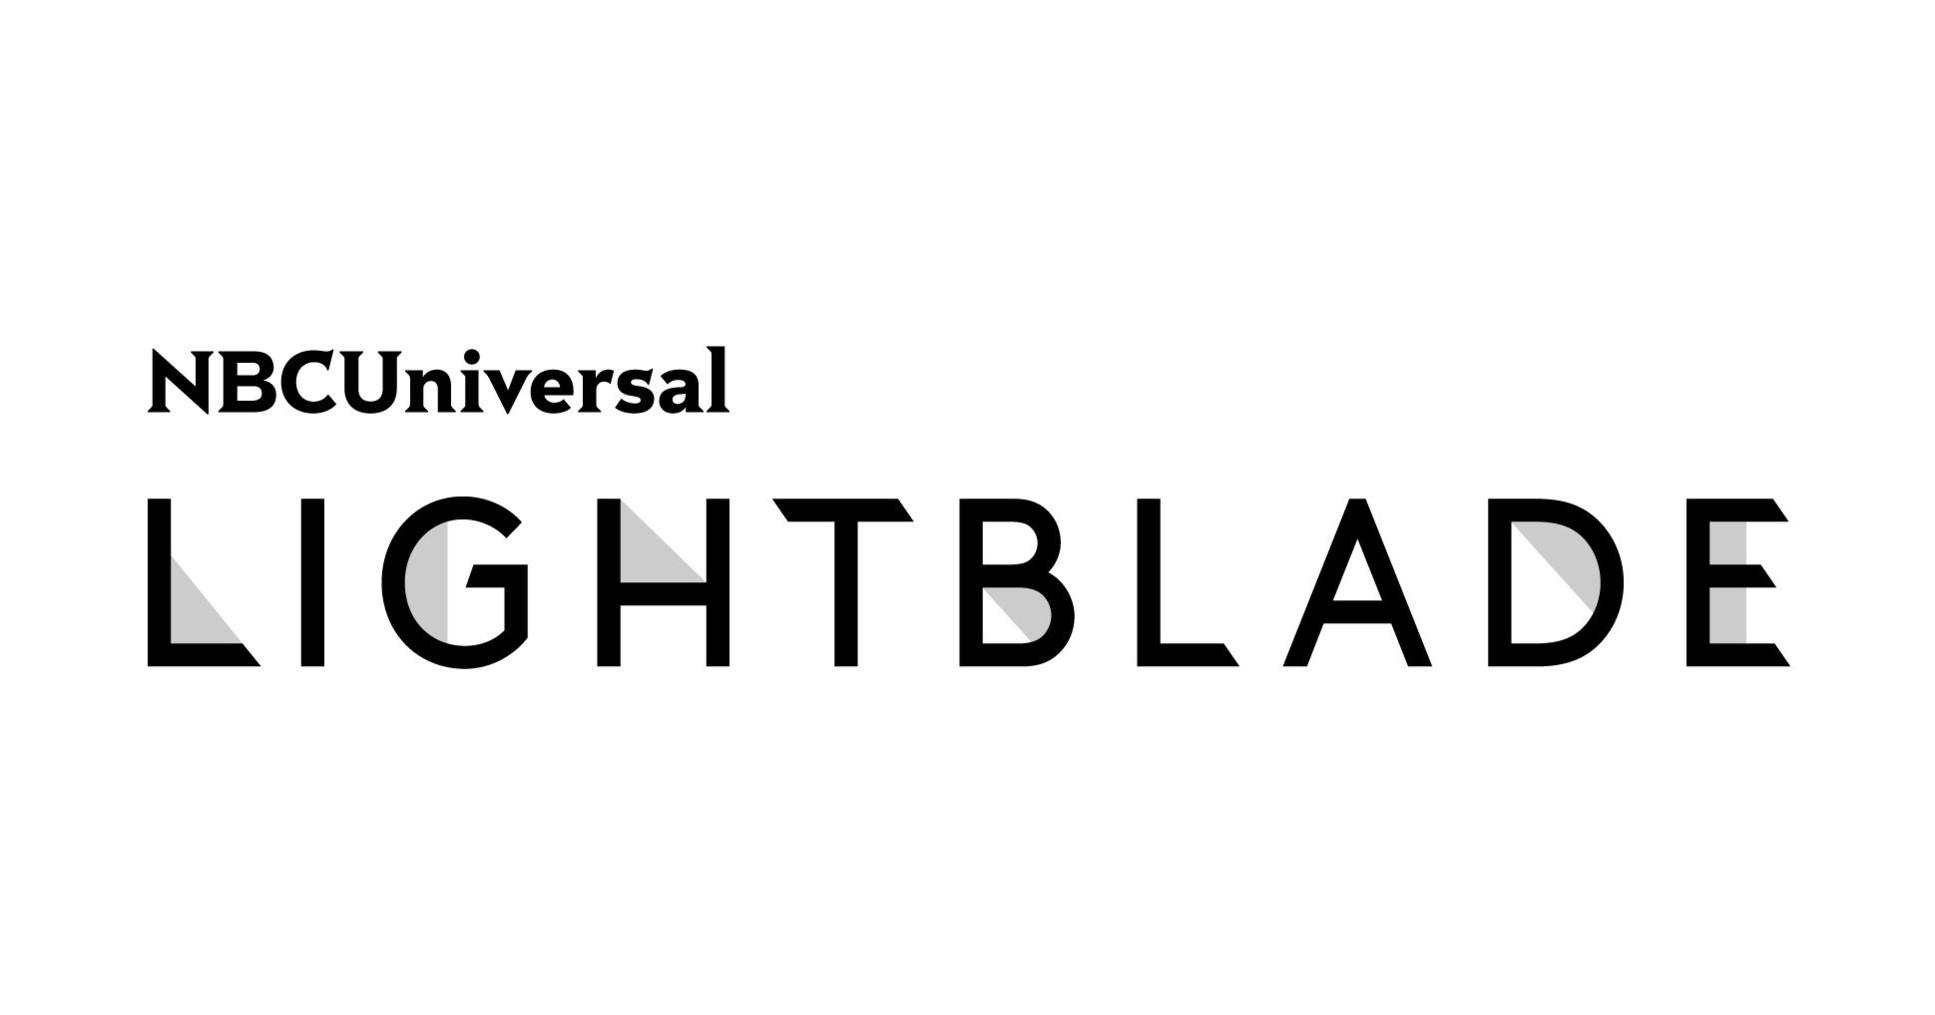 NBCUniversal LightBlade LED Production Lighting Debuts 3